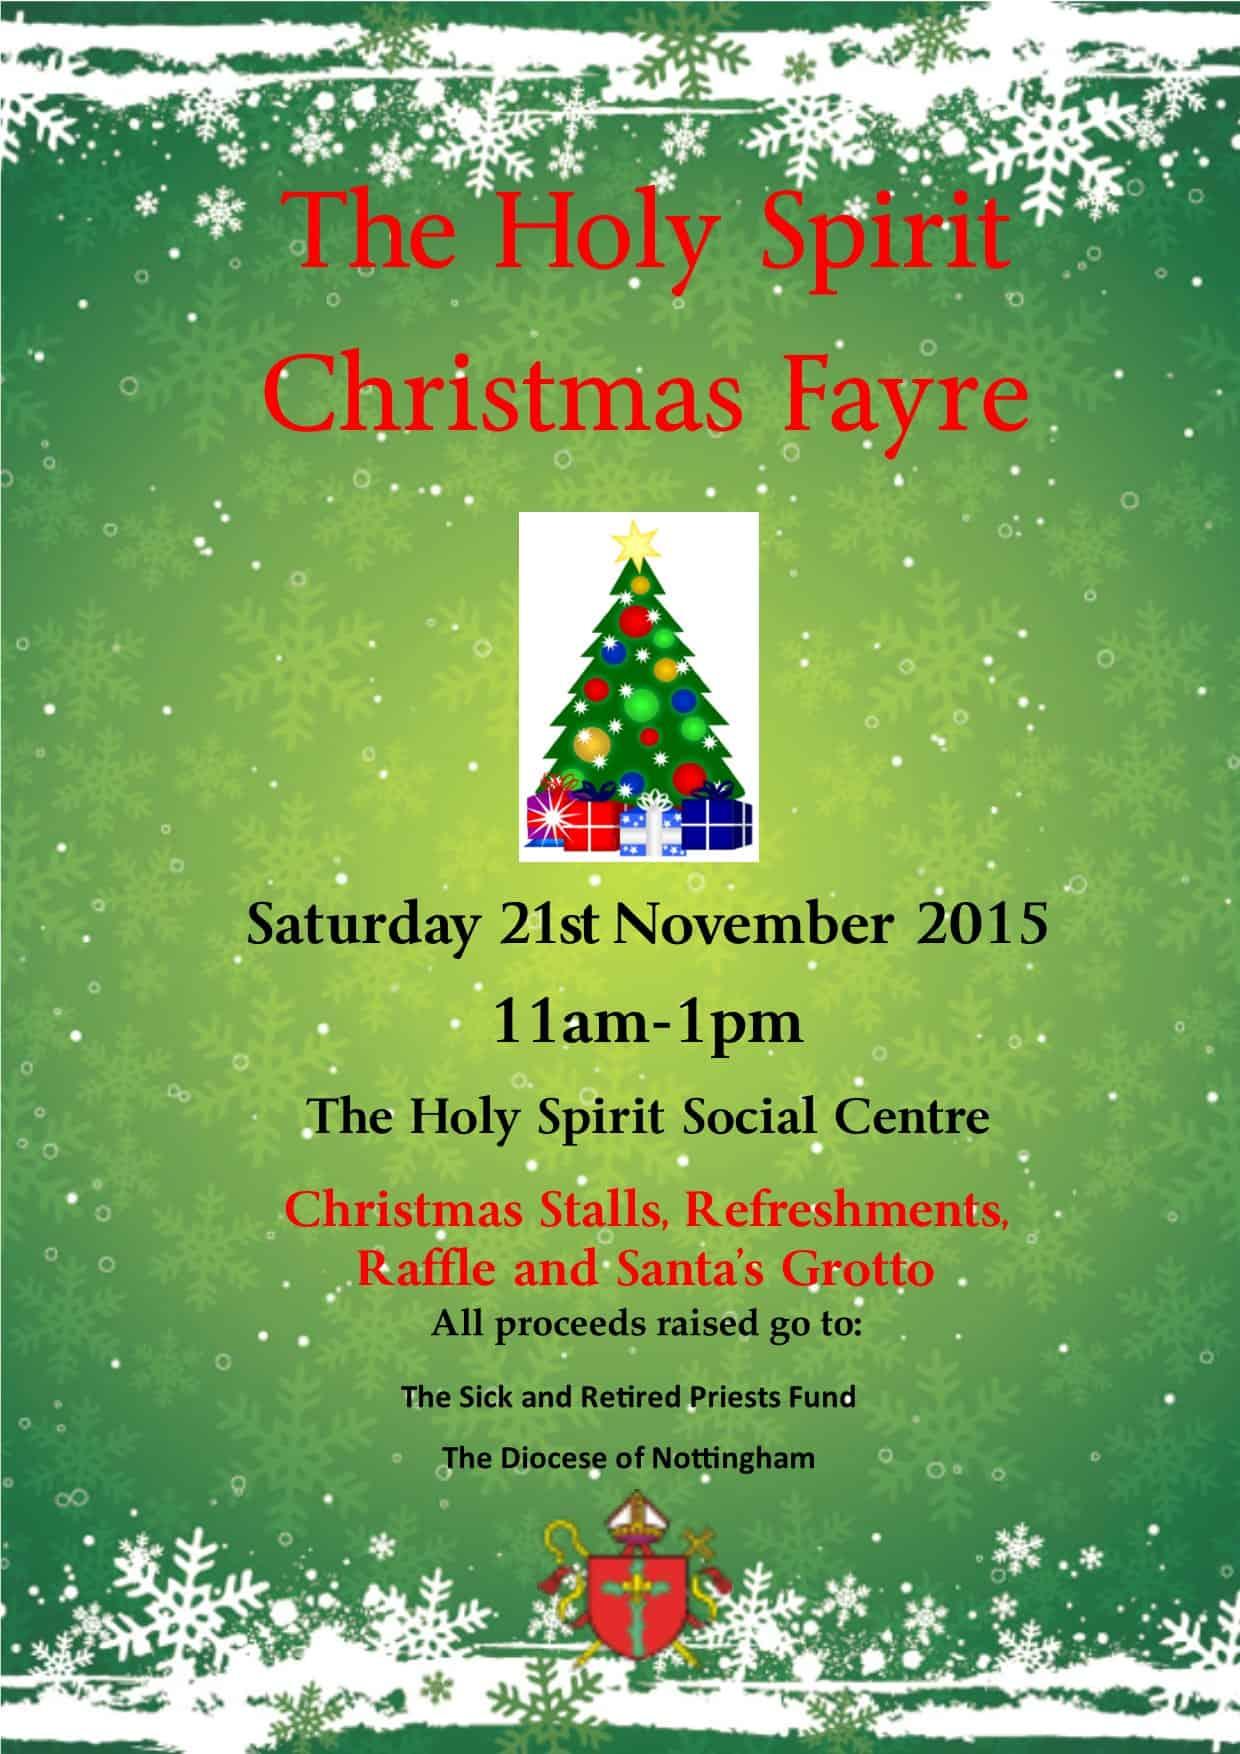 Christmas Fayre 2015 Poster